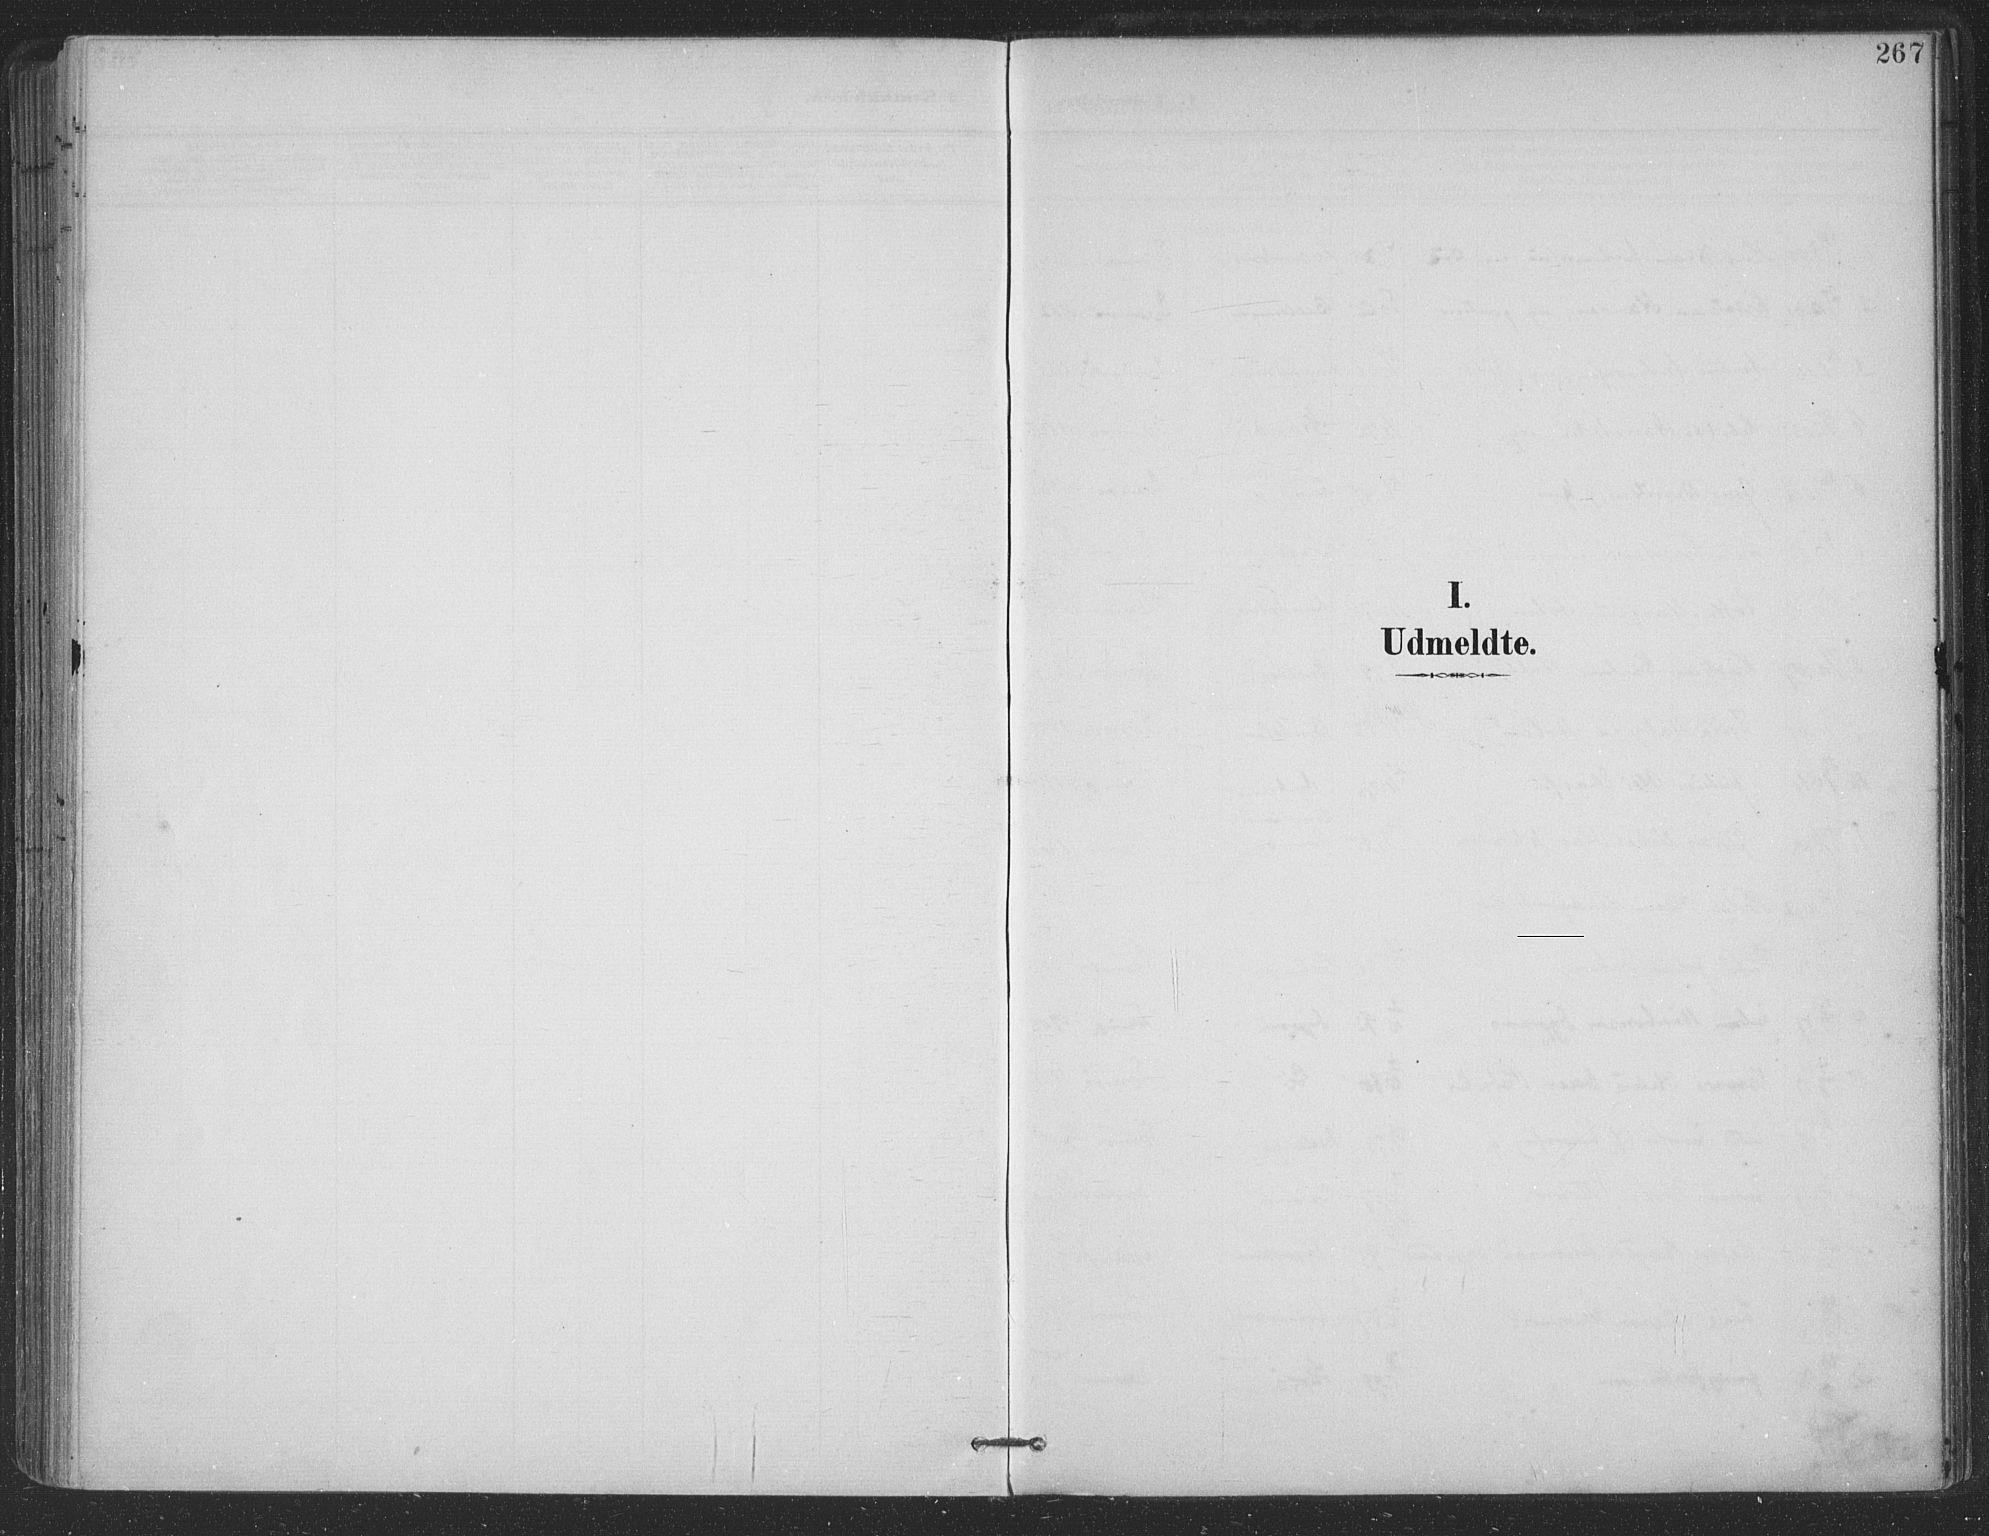 SAT, Ministerialprotokoller, klokkerbøker og fødselsregistre - Nordland, 863/L0899: Ministerialbok nr. 863A11, 1897-1906, s. 267